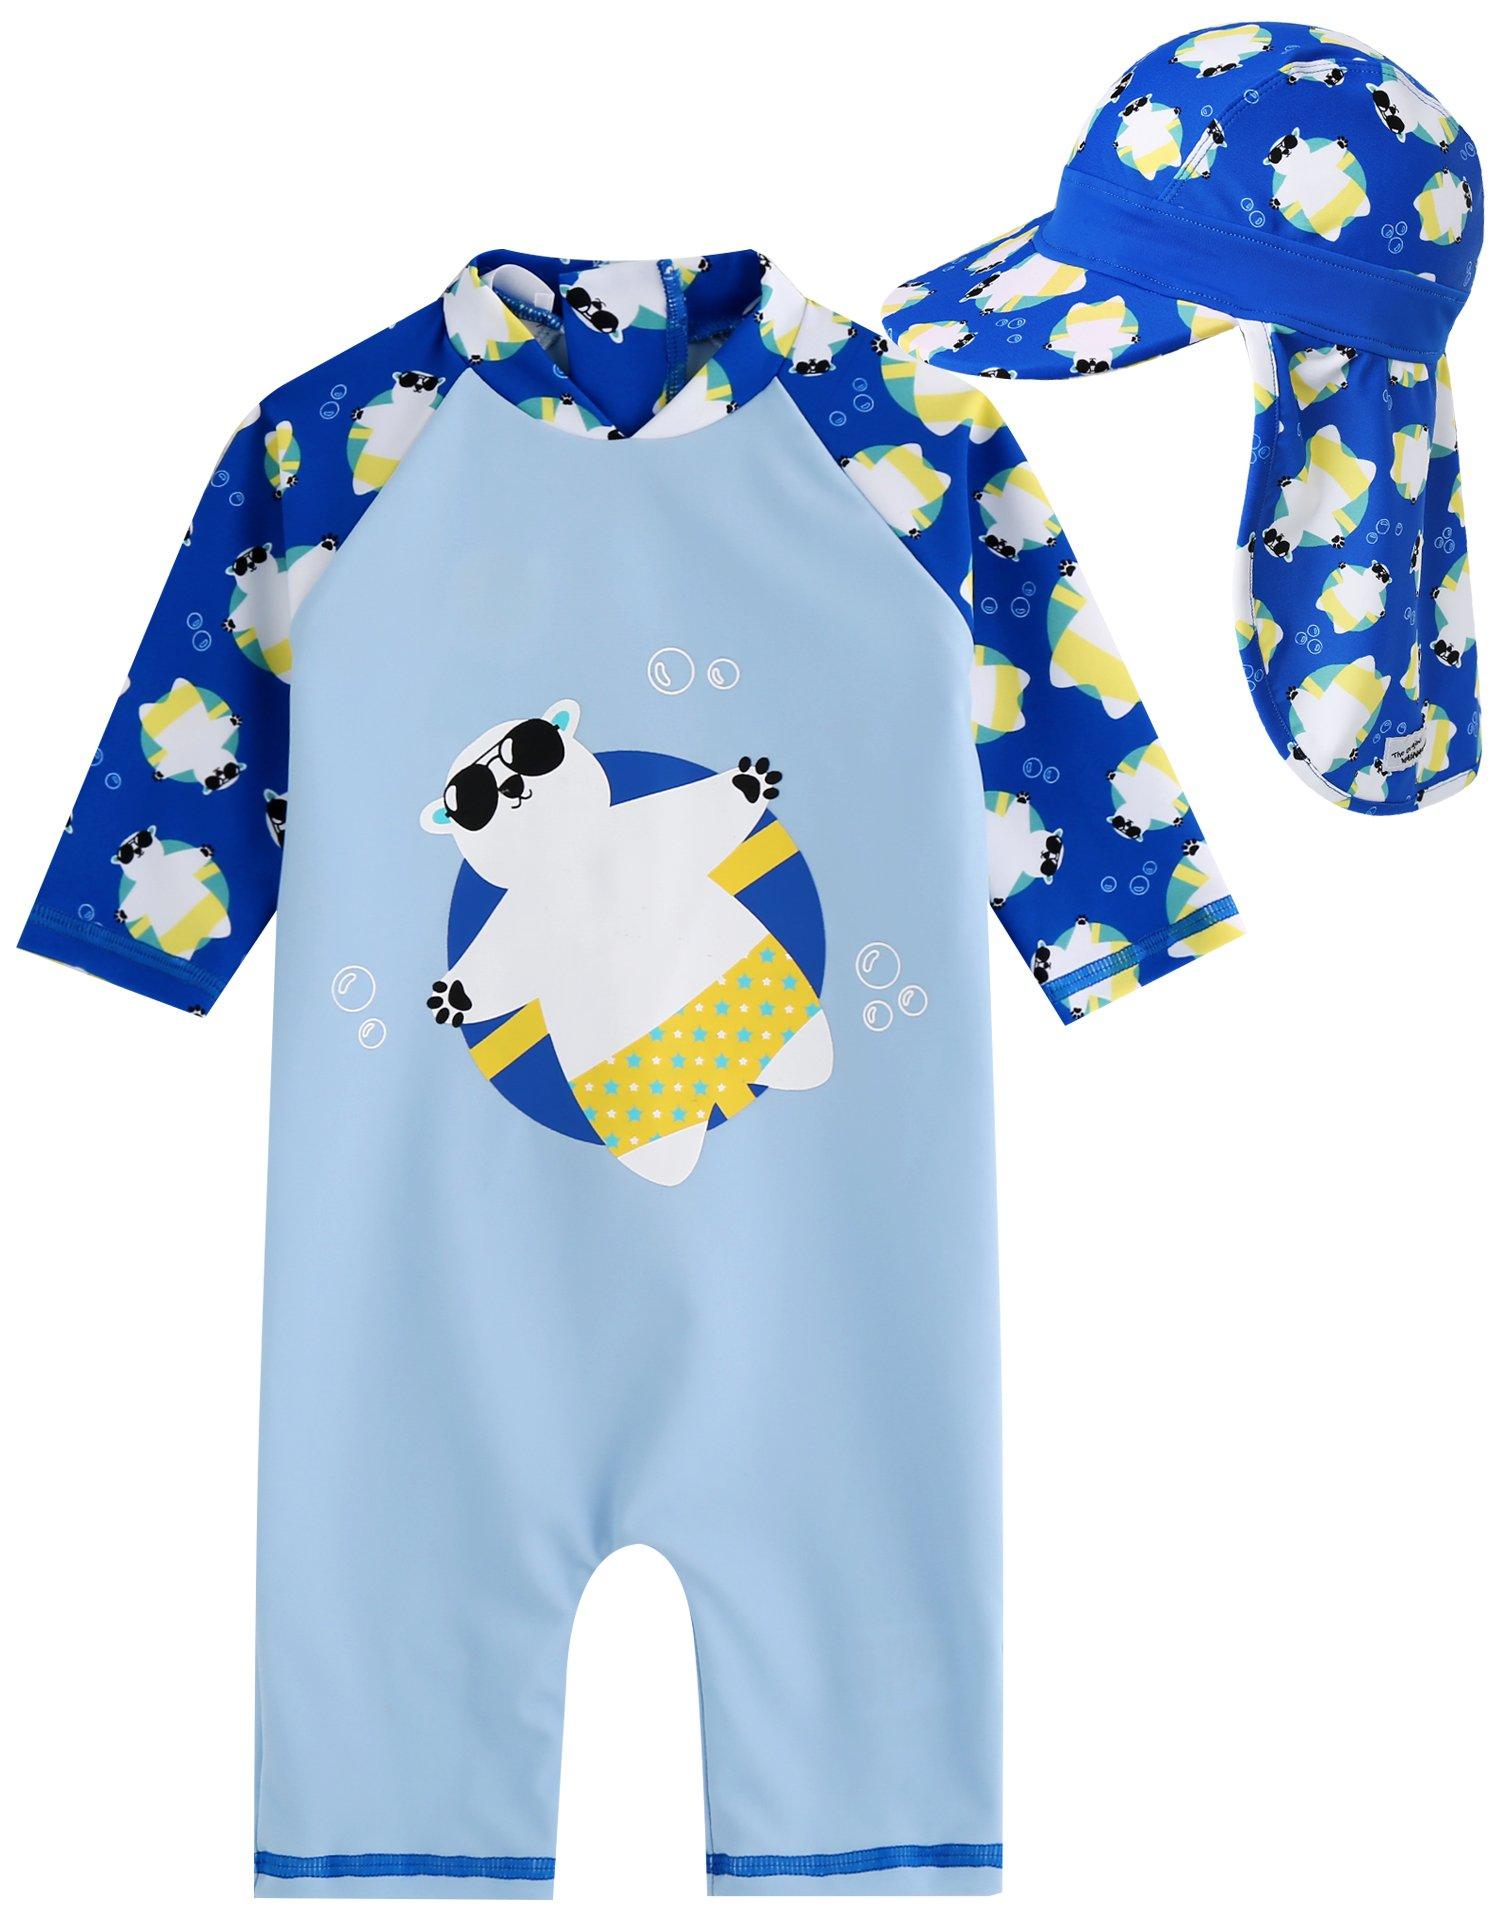 Vaenait baby Little Boys Swimsuit Rashguard Swimwear with Flapcap Tanning Bear Blue Baby L by Vaenait baby